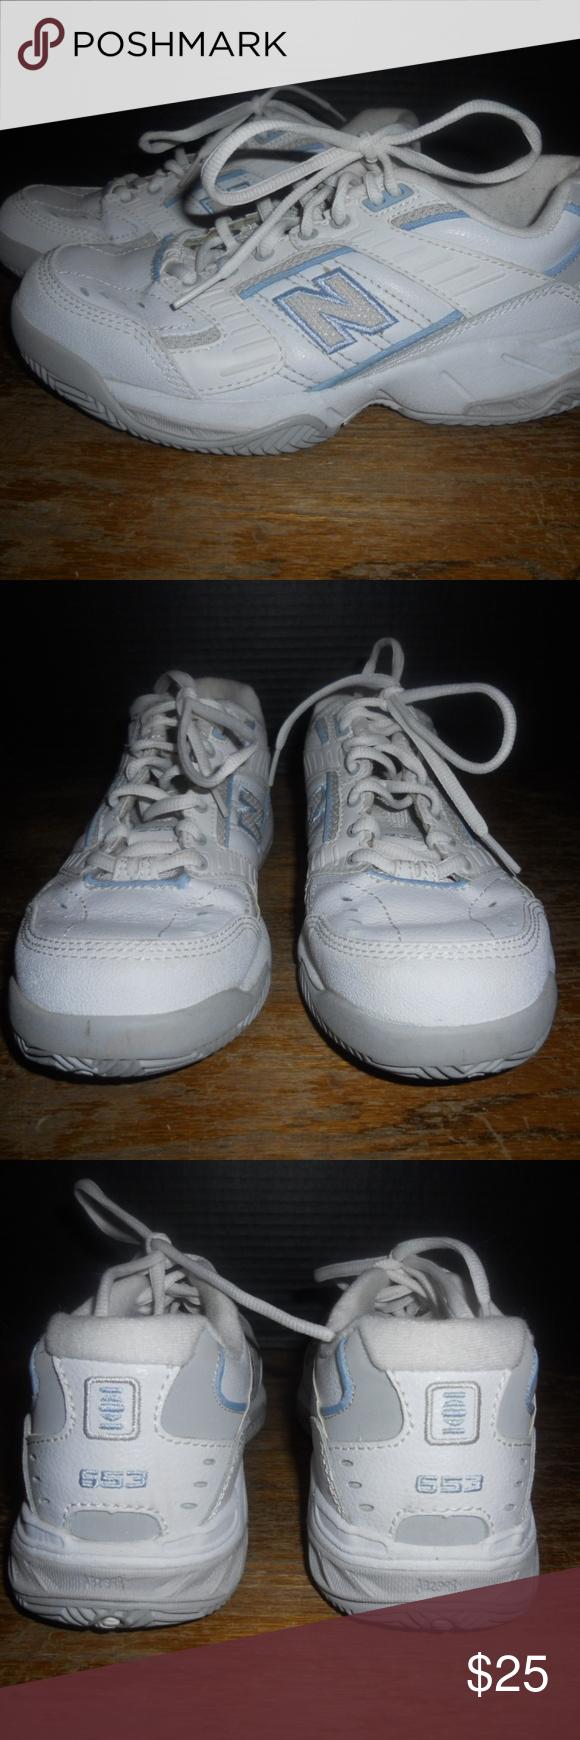 diagonal muelle Comida sana  New Balance 653 Women's Athletic Shoes Size 7 New Balance 653 Women's Court  Sneaker Shoes White Blue Size… | Womens athletic shoes, New balance shoes,  White sneaker